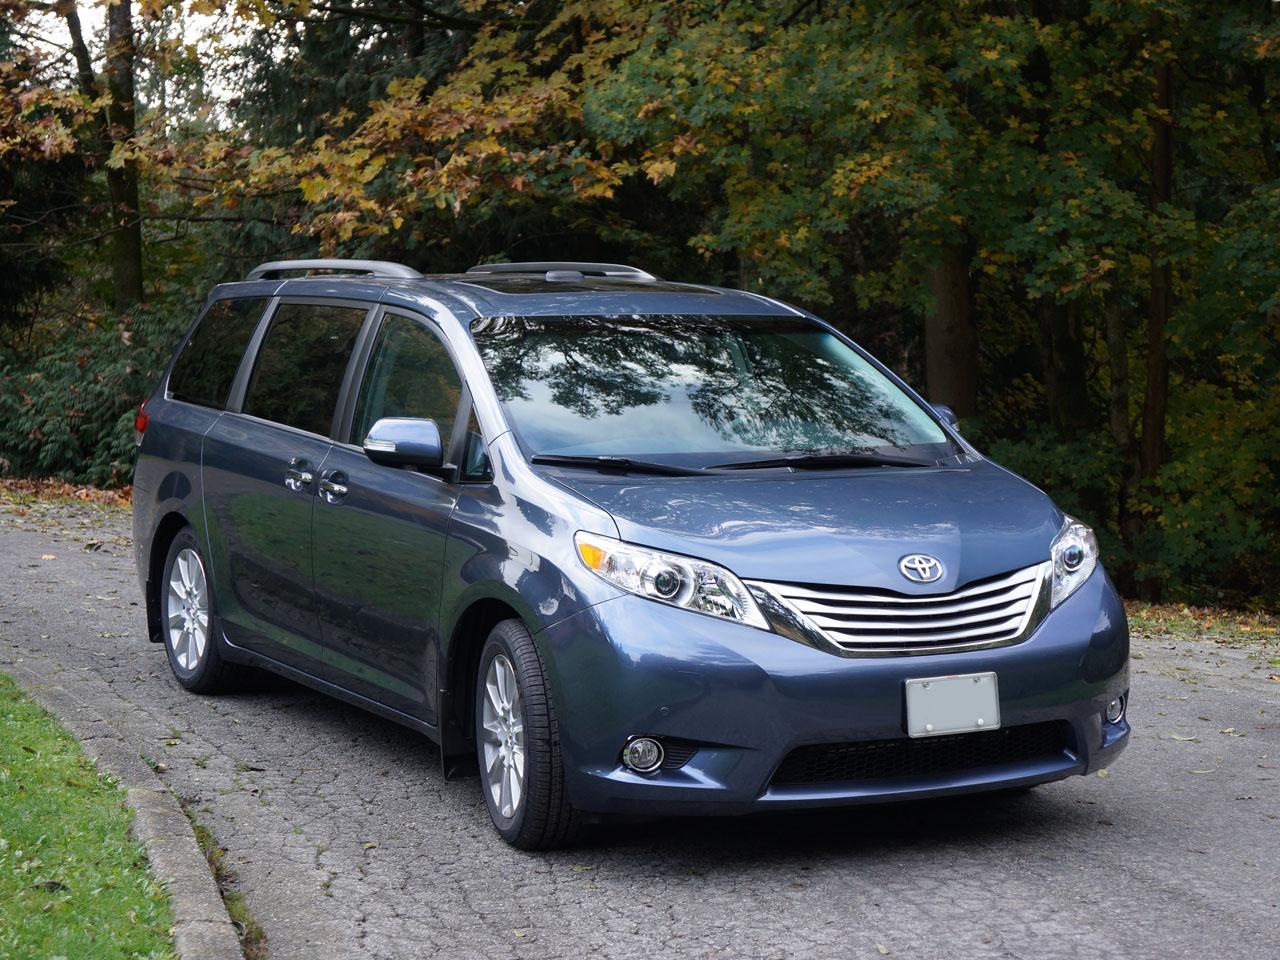 Toyota Sienna Service Manual: Road test